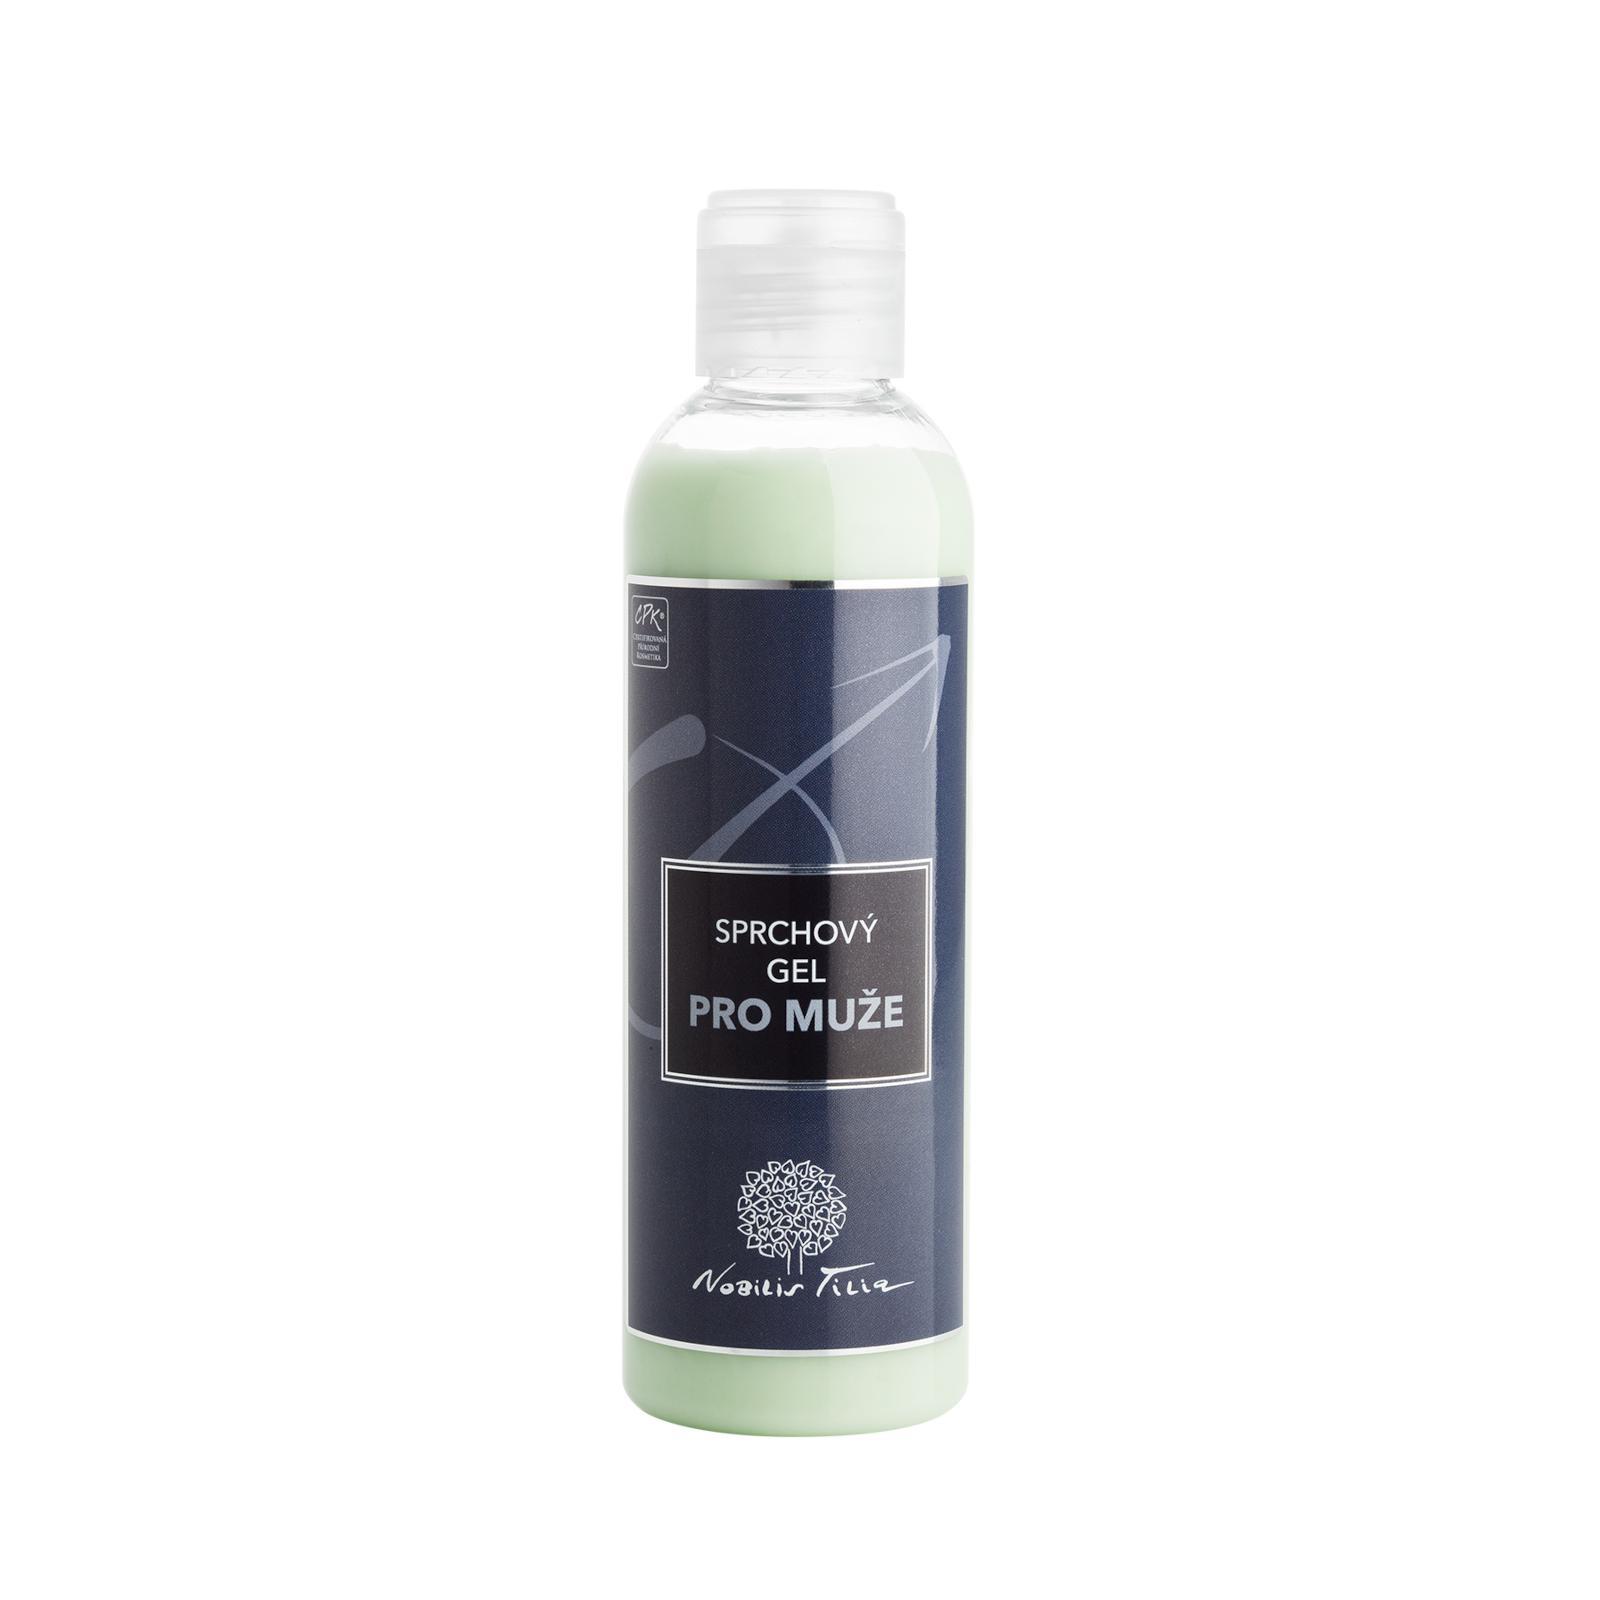 Nobilis Tilia Sprchový gel s avokádovým olejem, pánský 200 ml